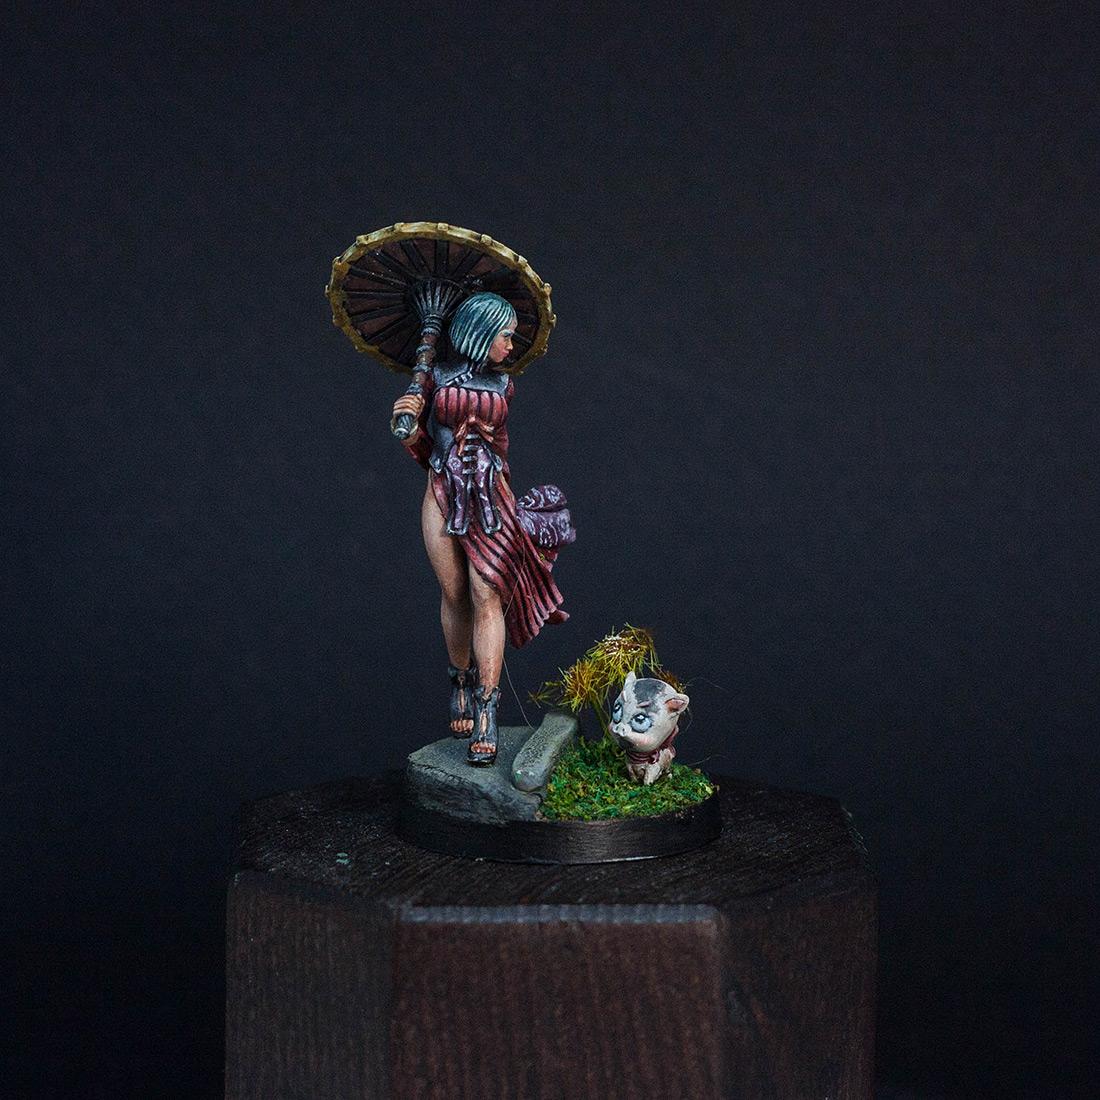 Miscellaneous: Lady Dragon, photo #2